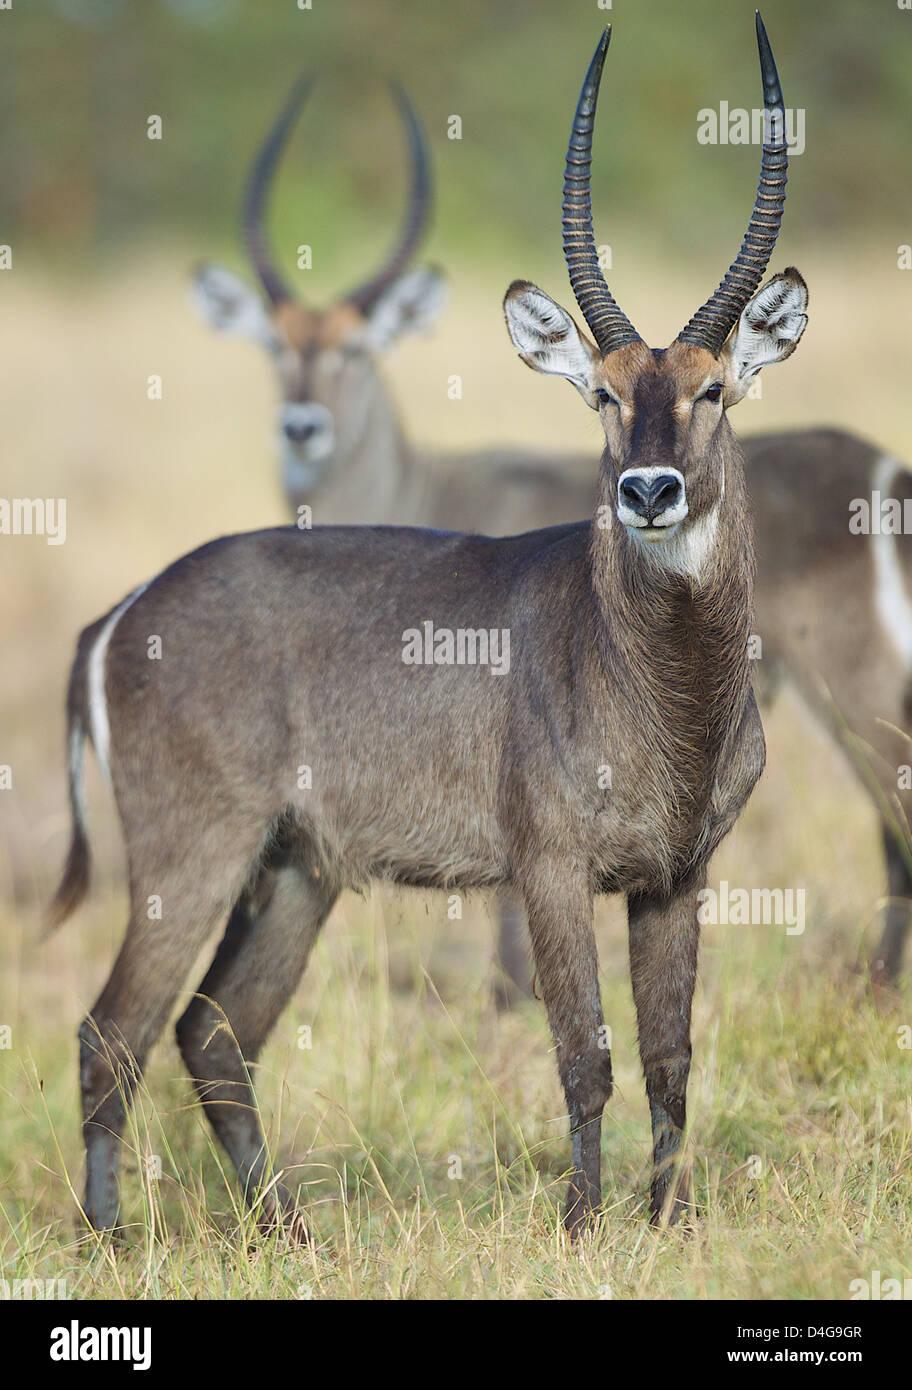 Male waterbuck  Kobus ellipsiprymnus  Saadani National Park  Tanzania Africa - Stock Image